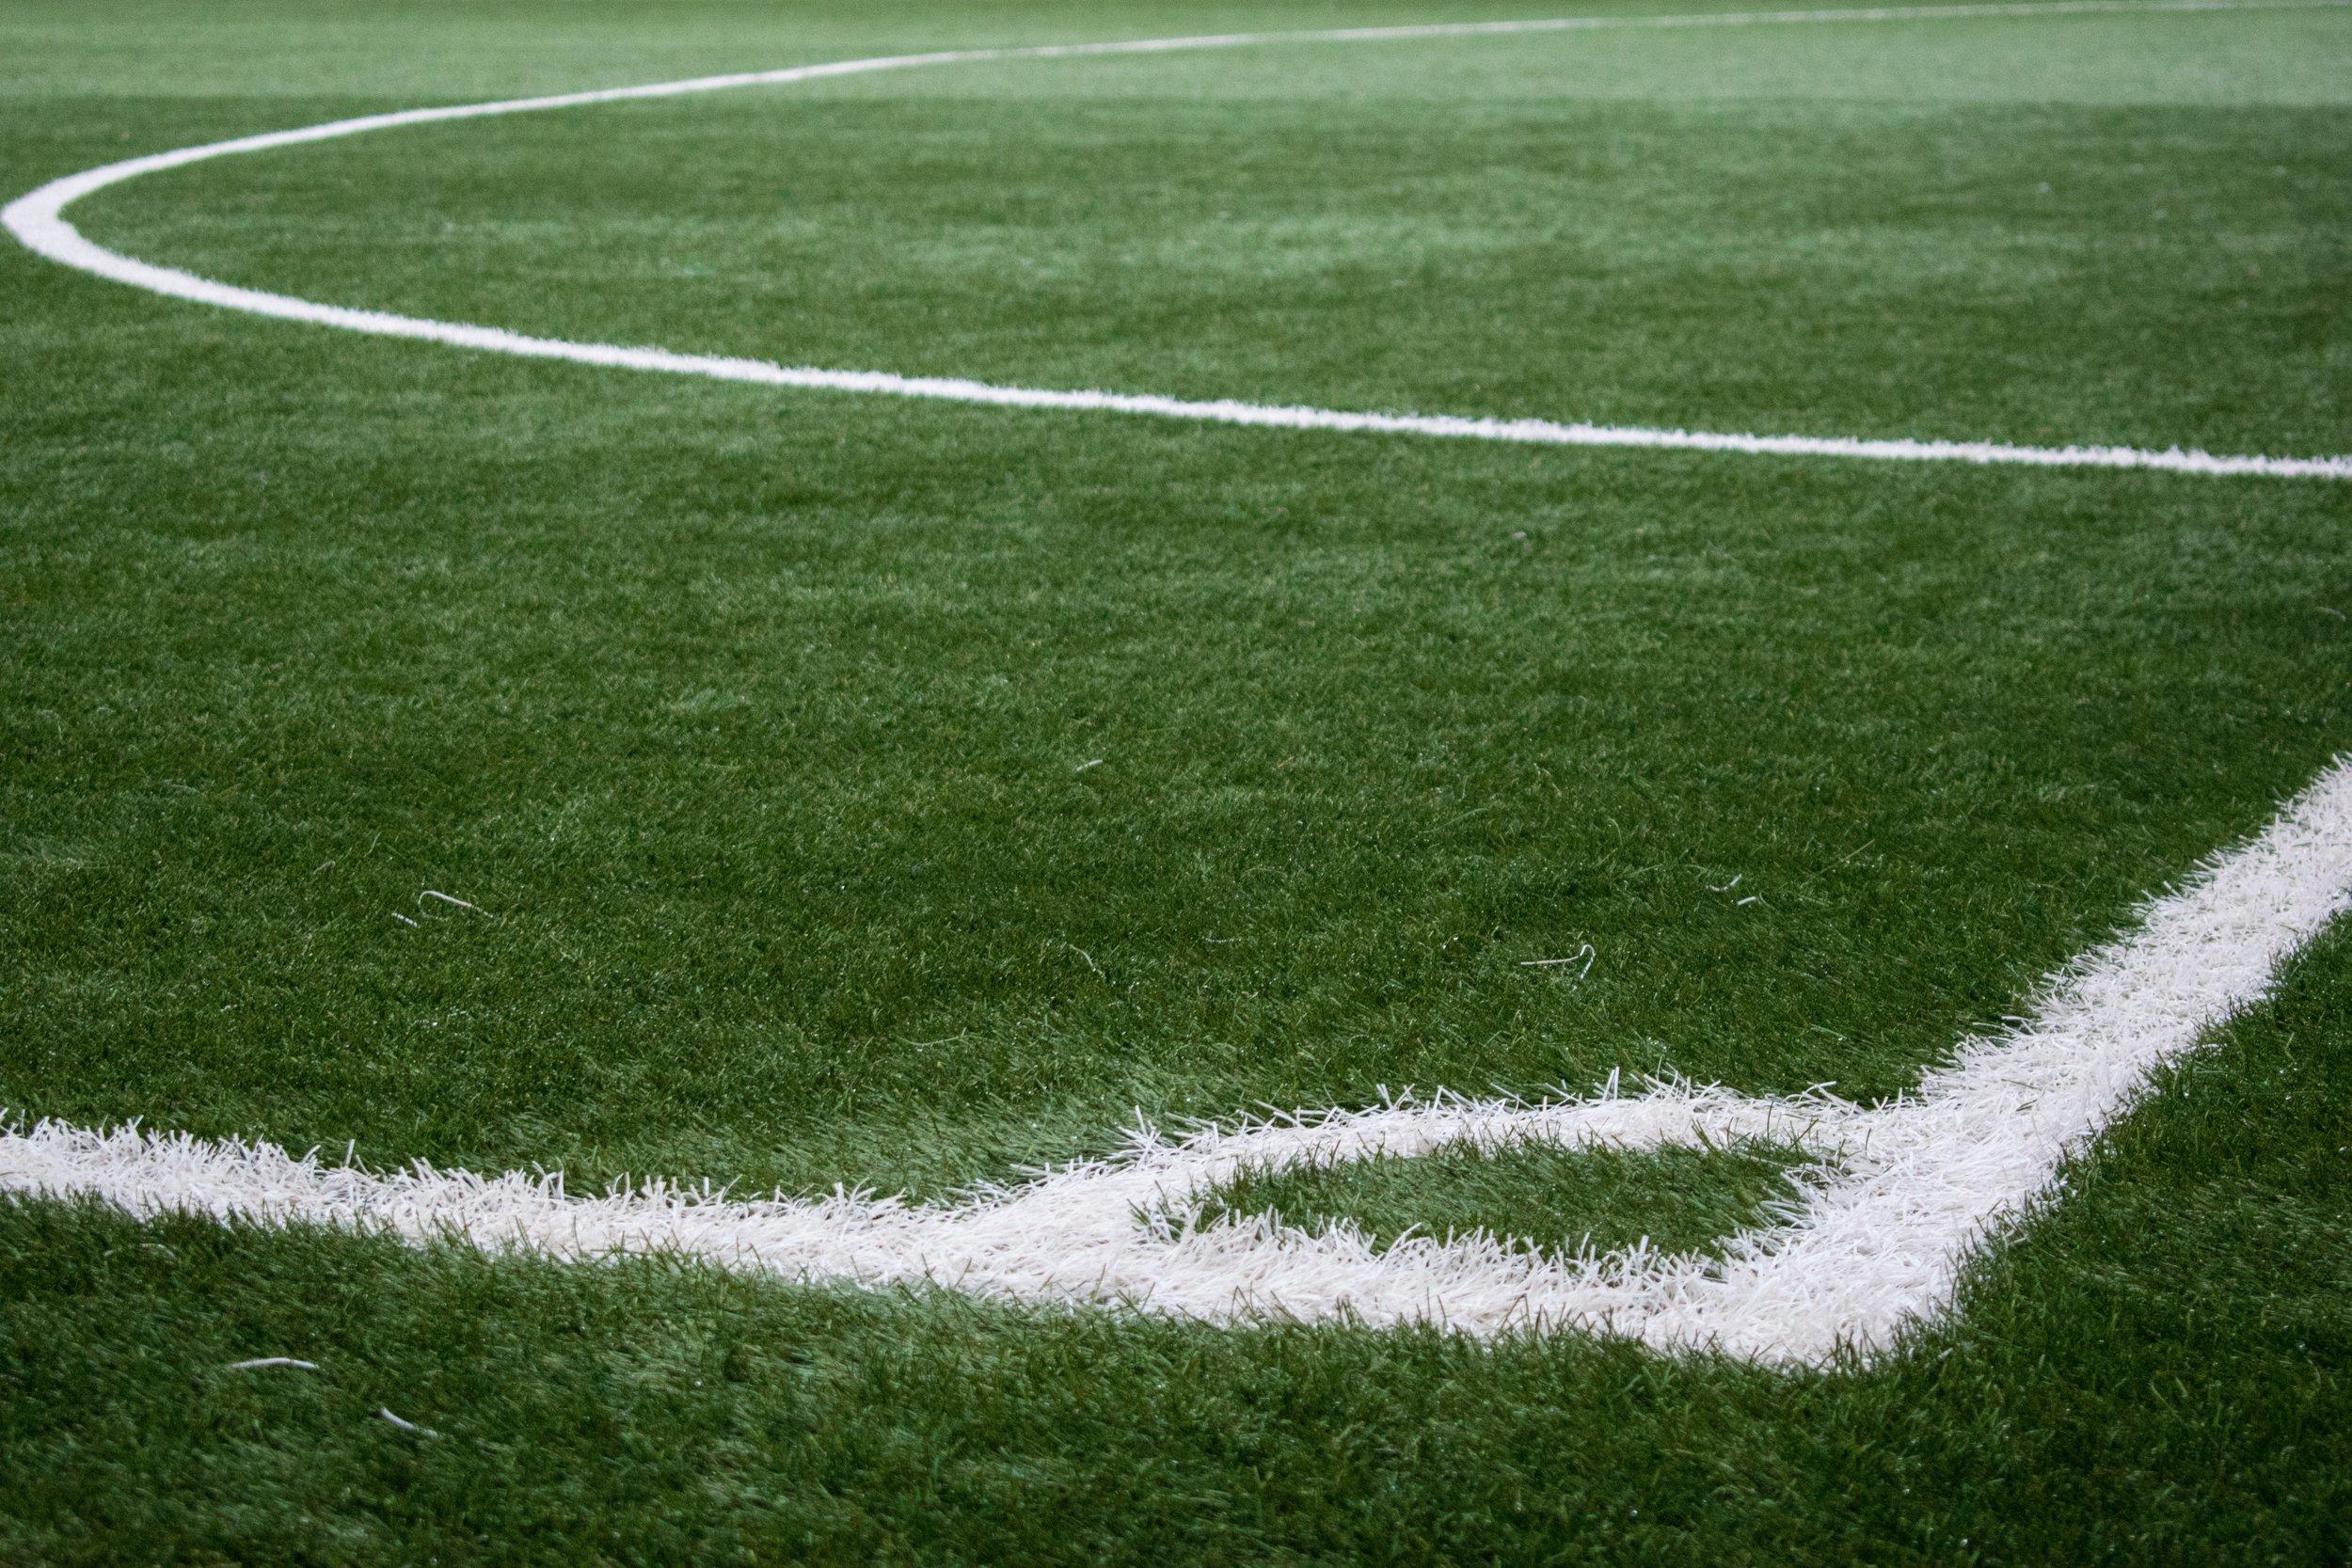 corner-field-football-field-240832.jpg